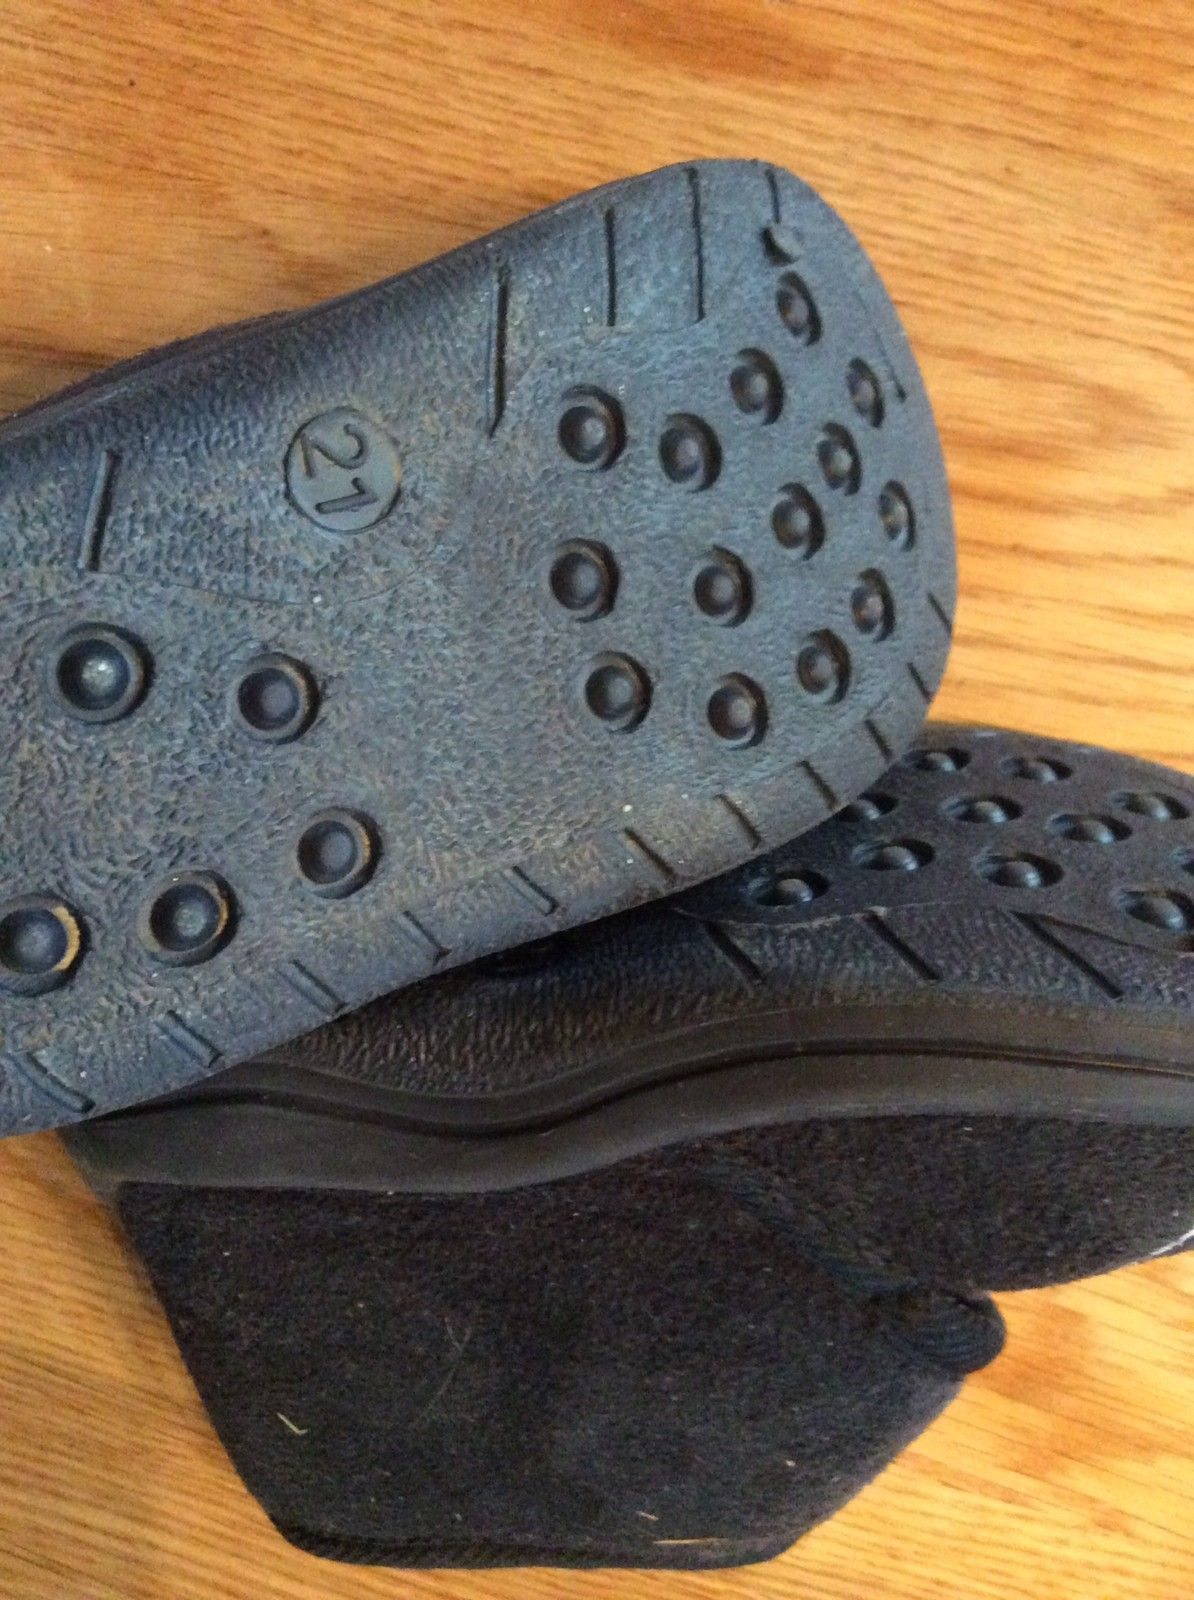 Ecco etc sko gutt str 20 24 noen nye i eske | FINN.no